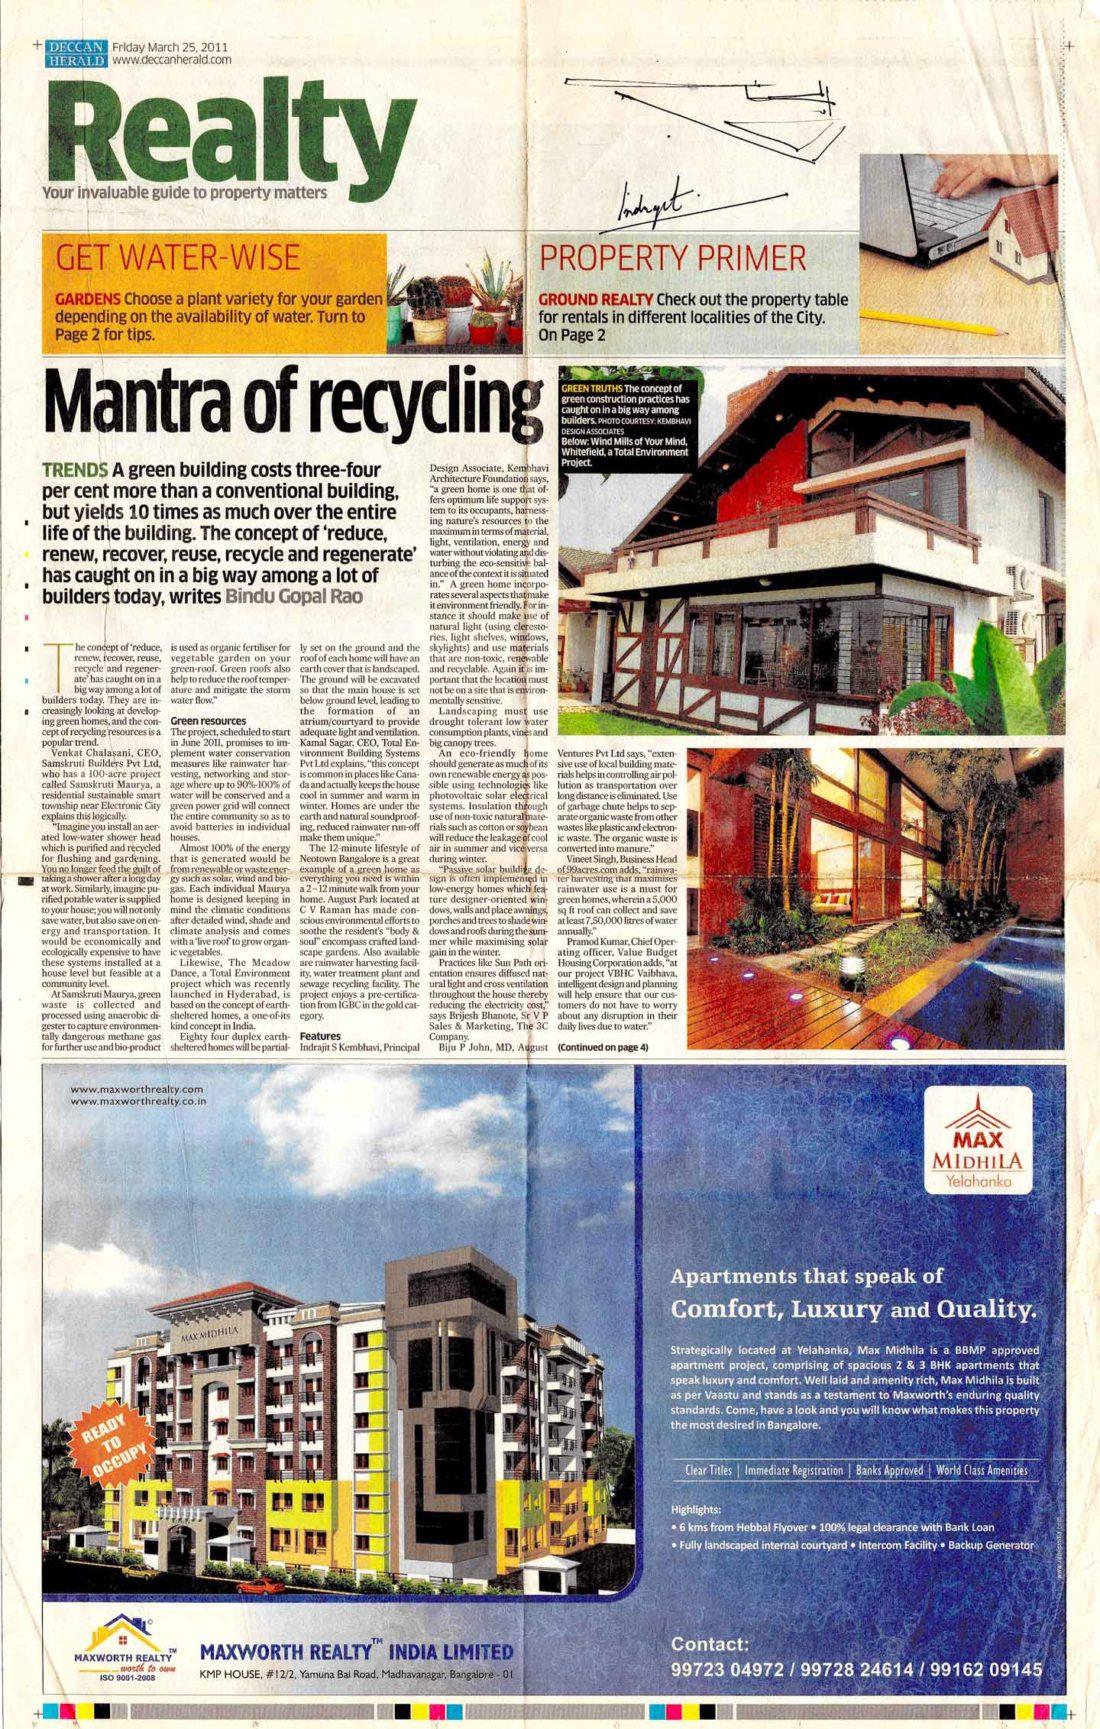 Deccan Herald | Kembhavi Architects Bangalore | Hubli